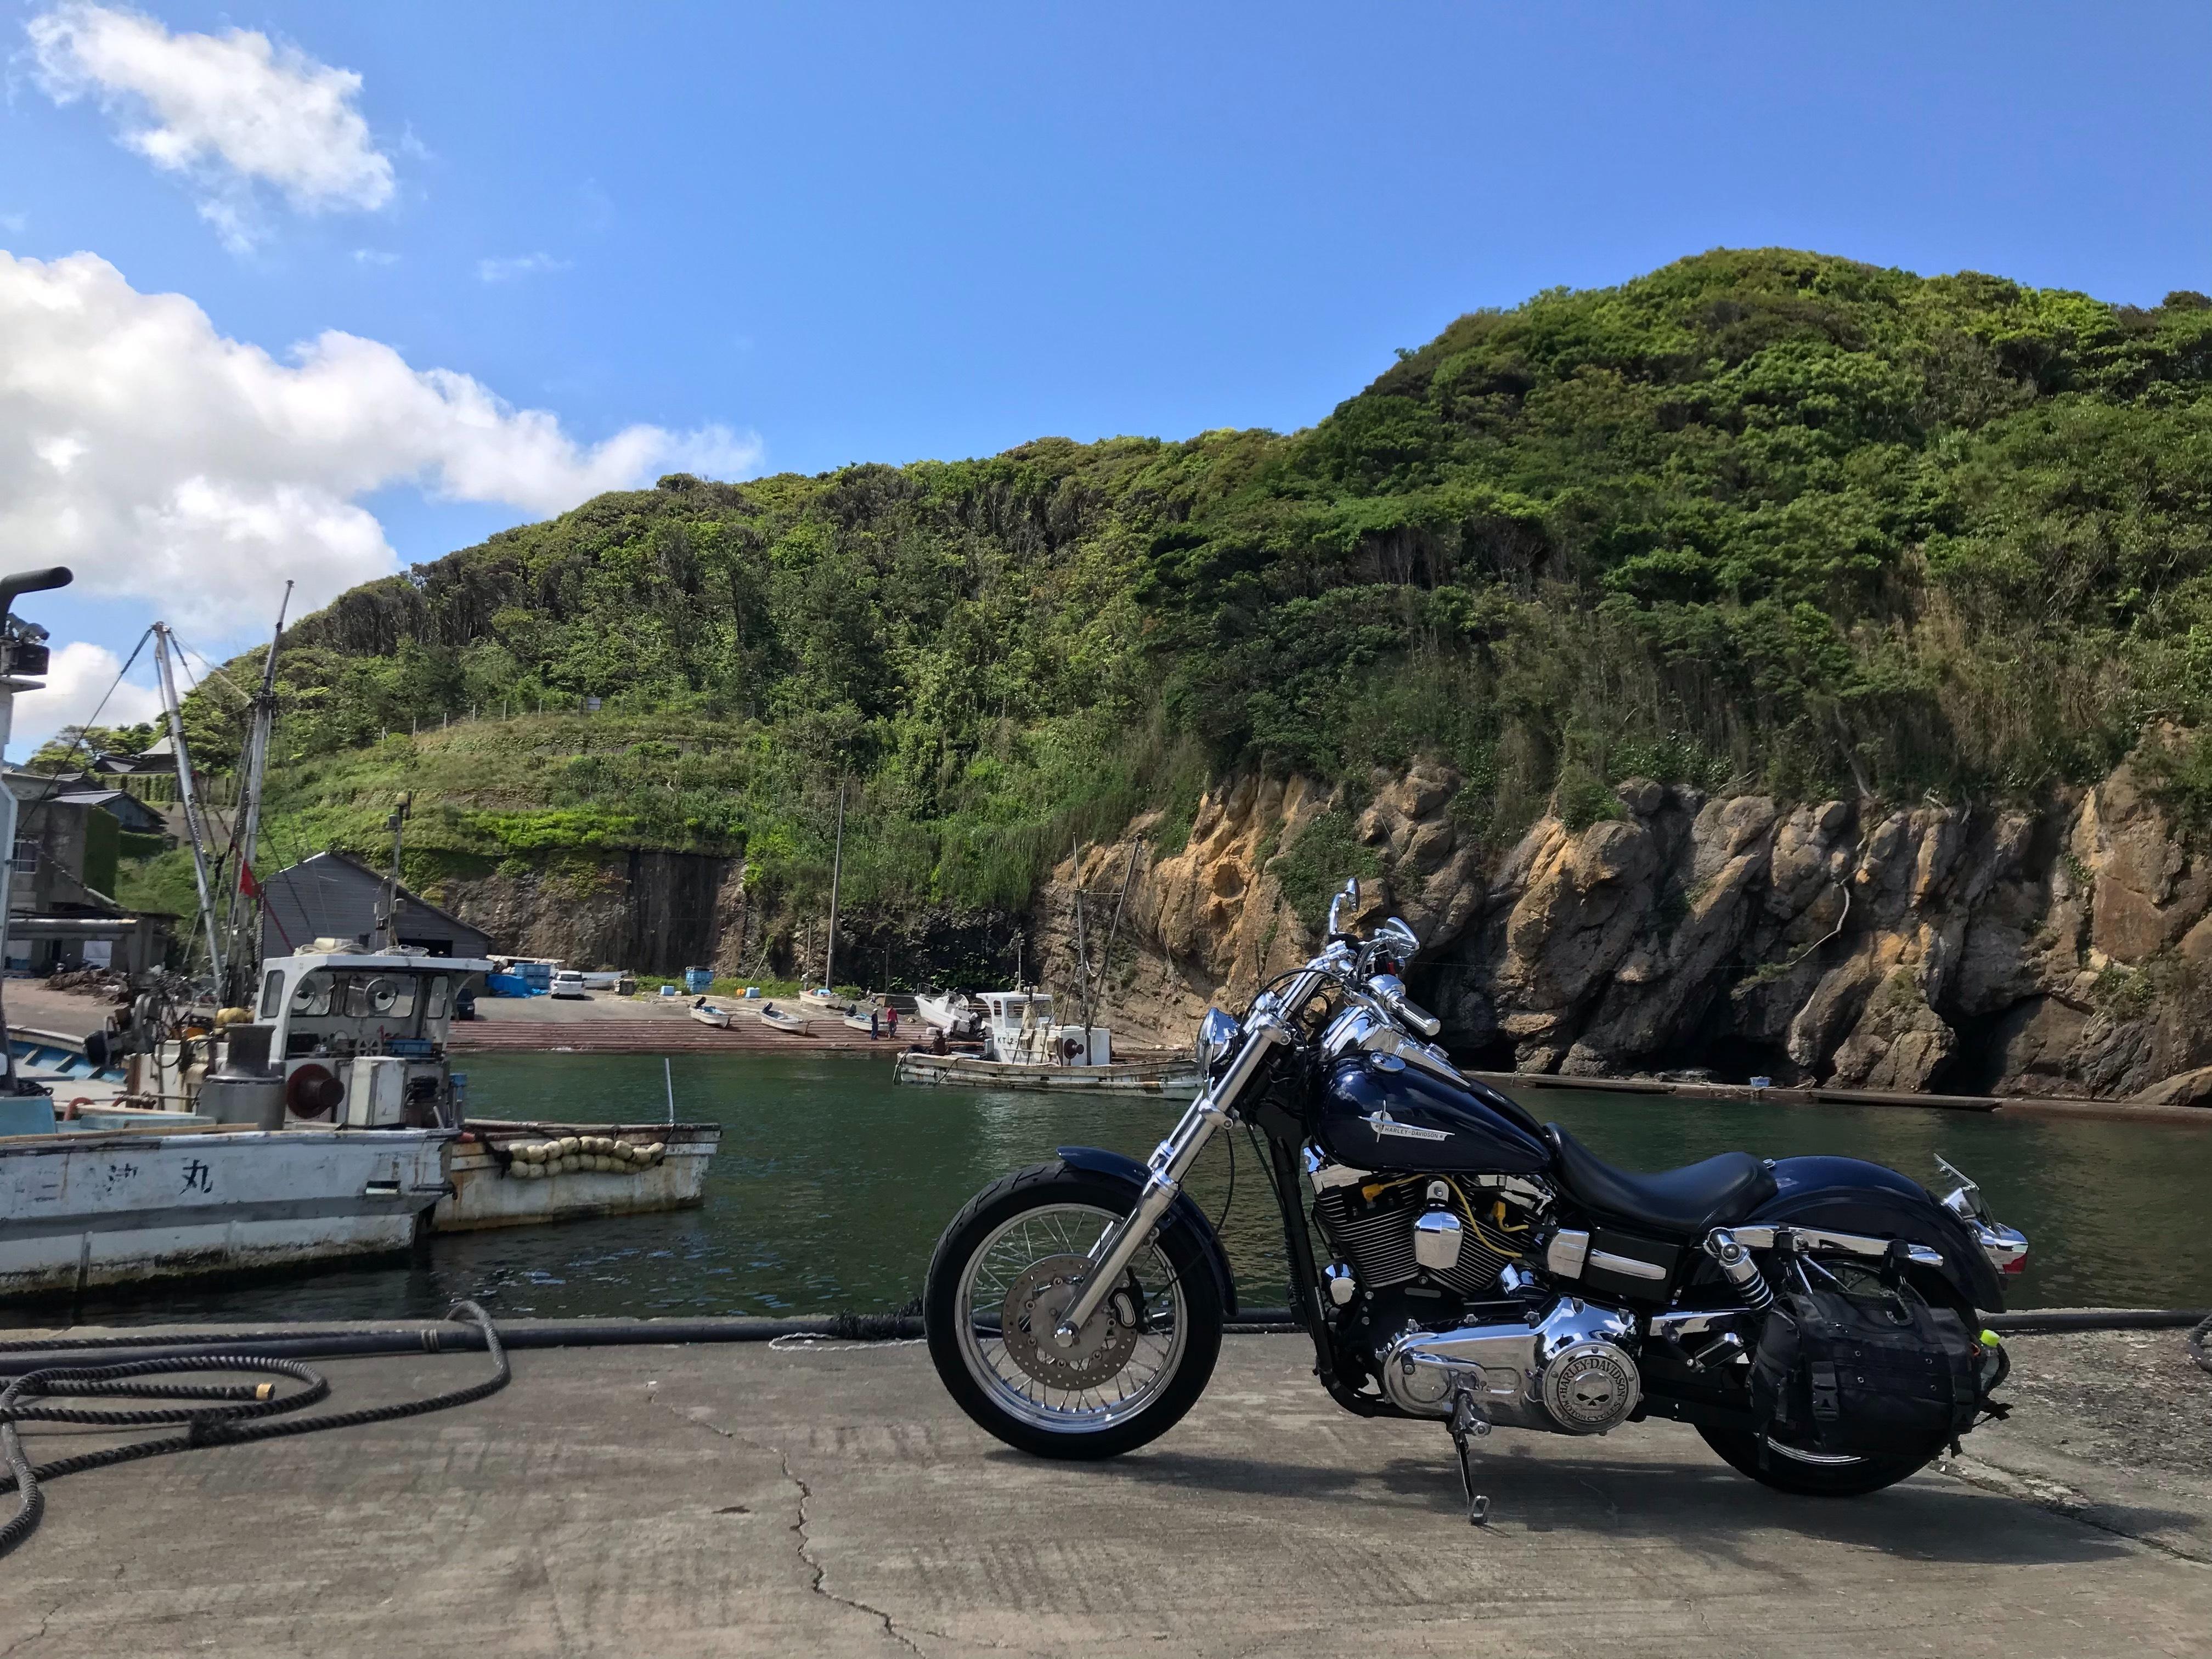 harleydavidson-motorcycle-touring-blog-kyoto-tanngopeninsula-fishingport.jpg